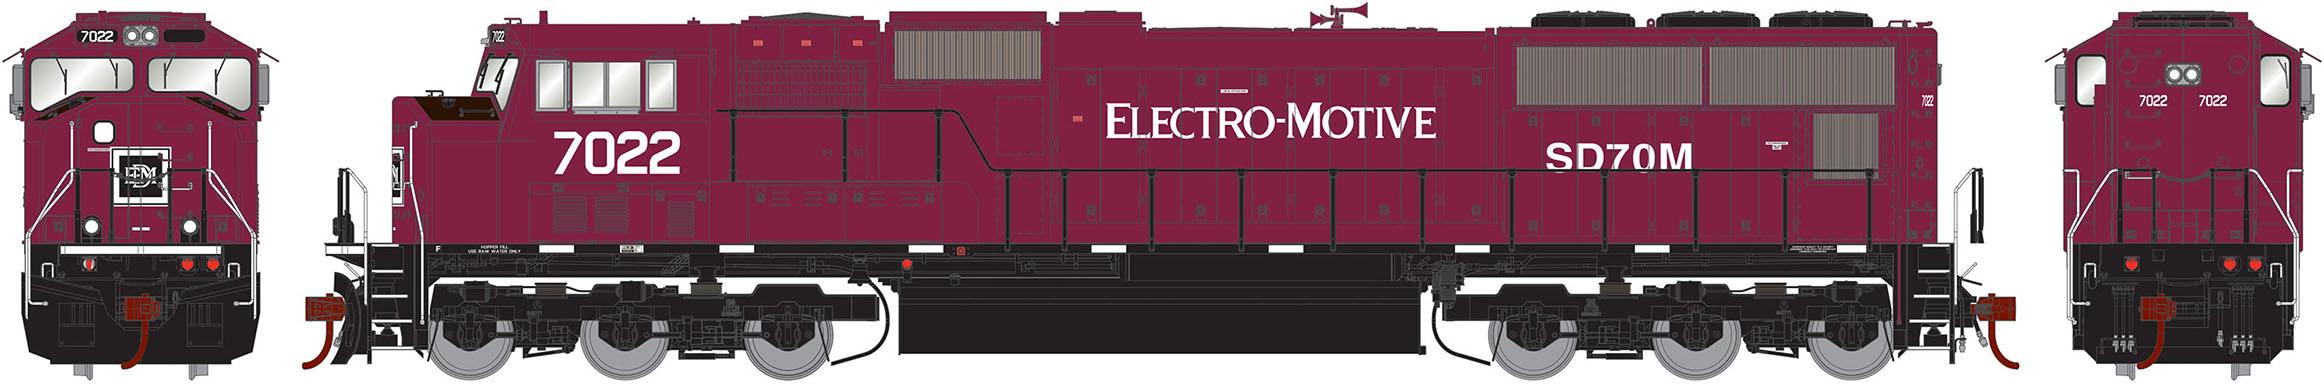 Athearn Genesis HO Scale EMD SD70M Diesel Locomotive EMD EMD EMD Lease  7022 0594f0